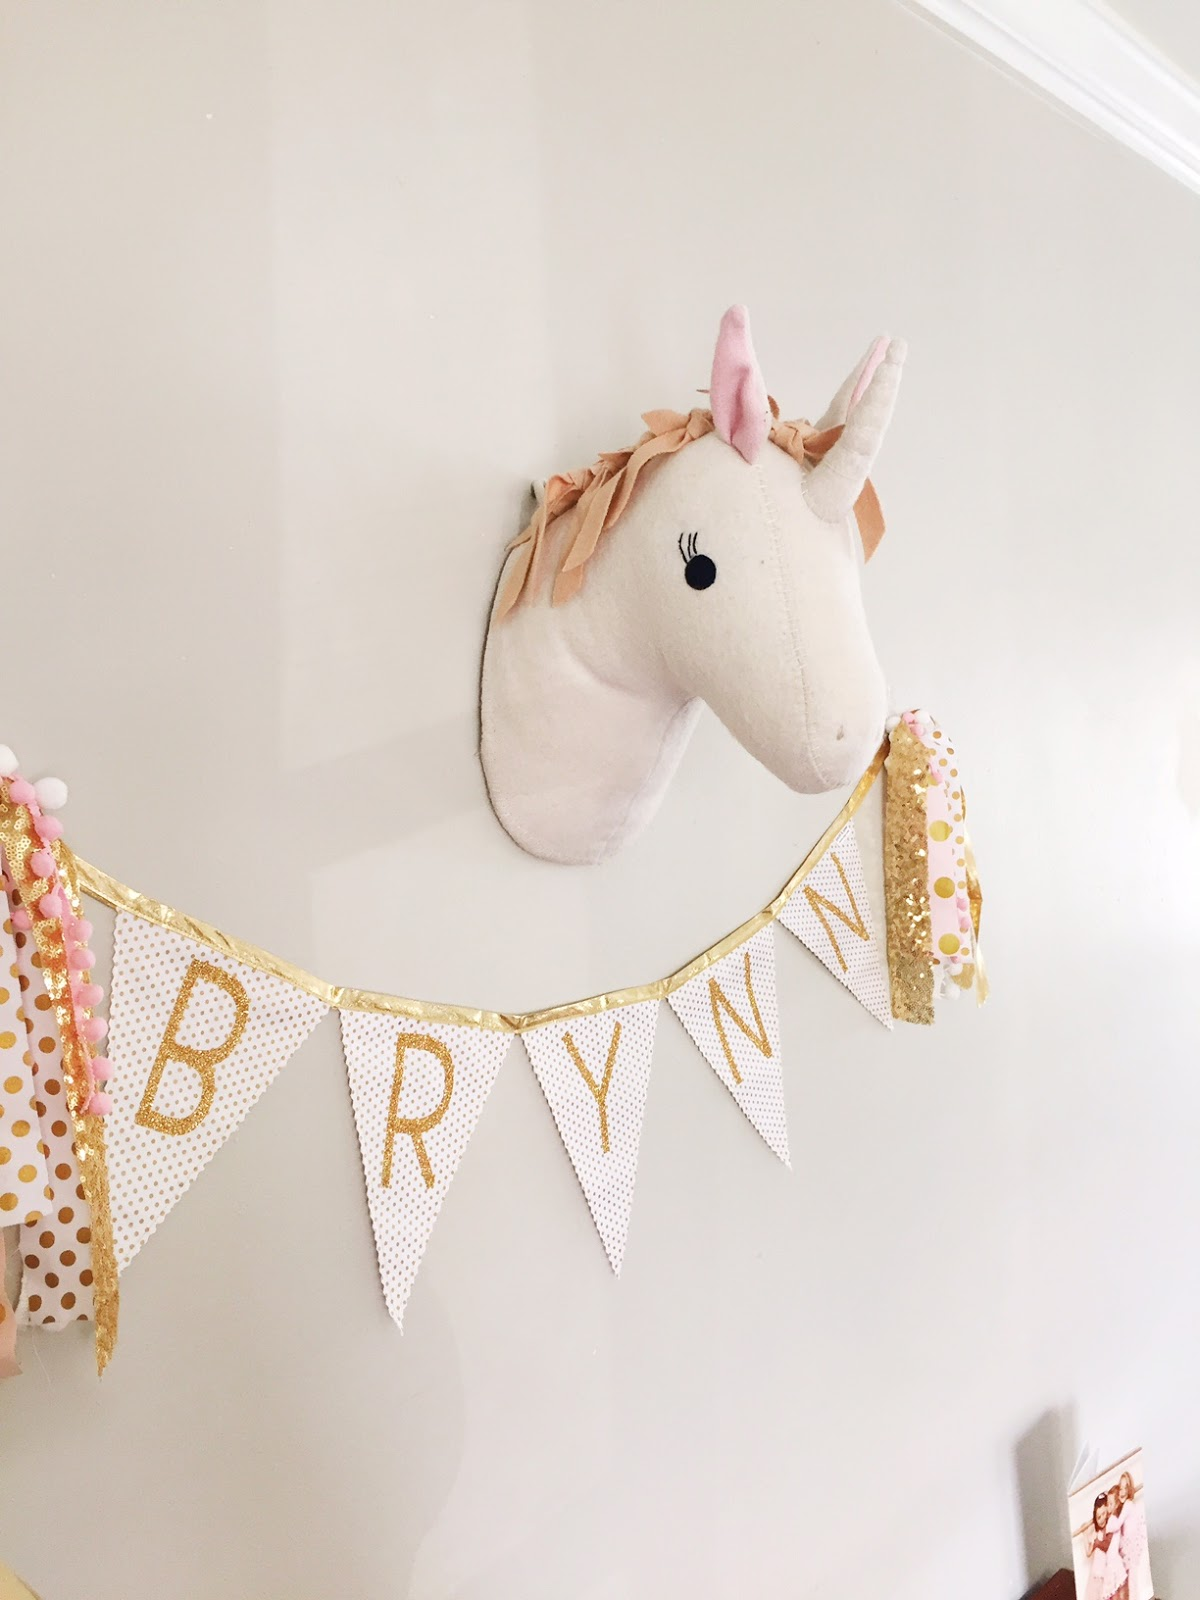 BUSHEL & PECK: Brynn's Pink Unicorn Party